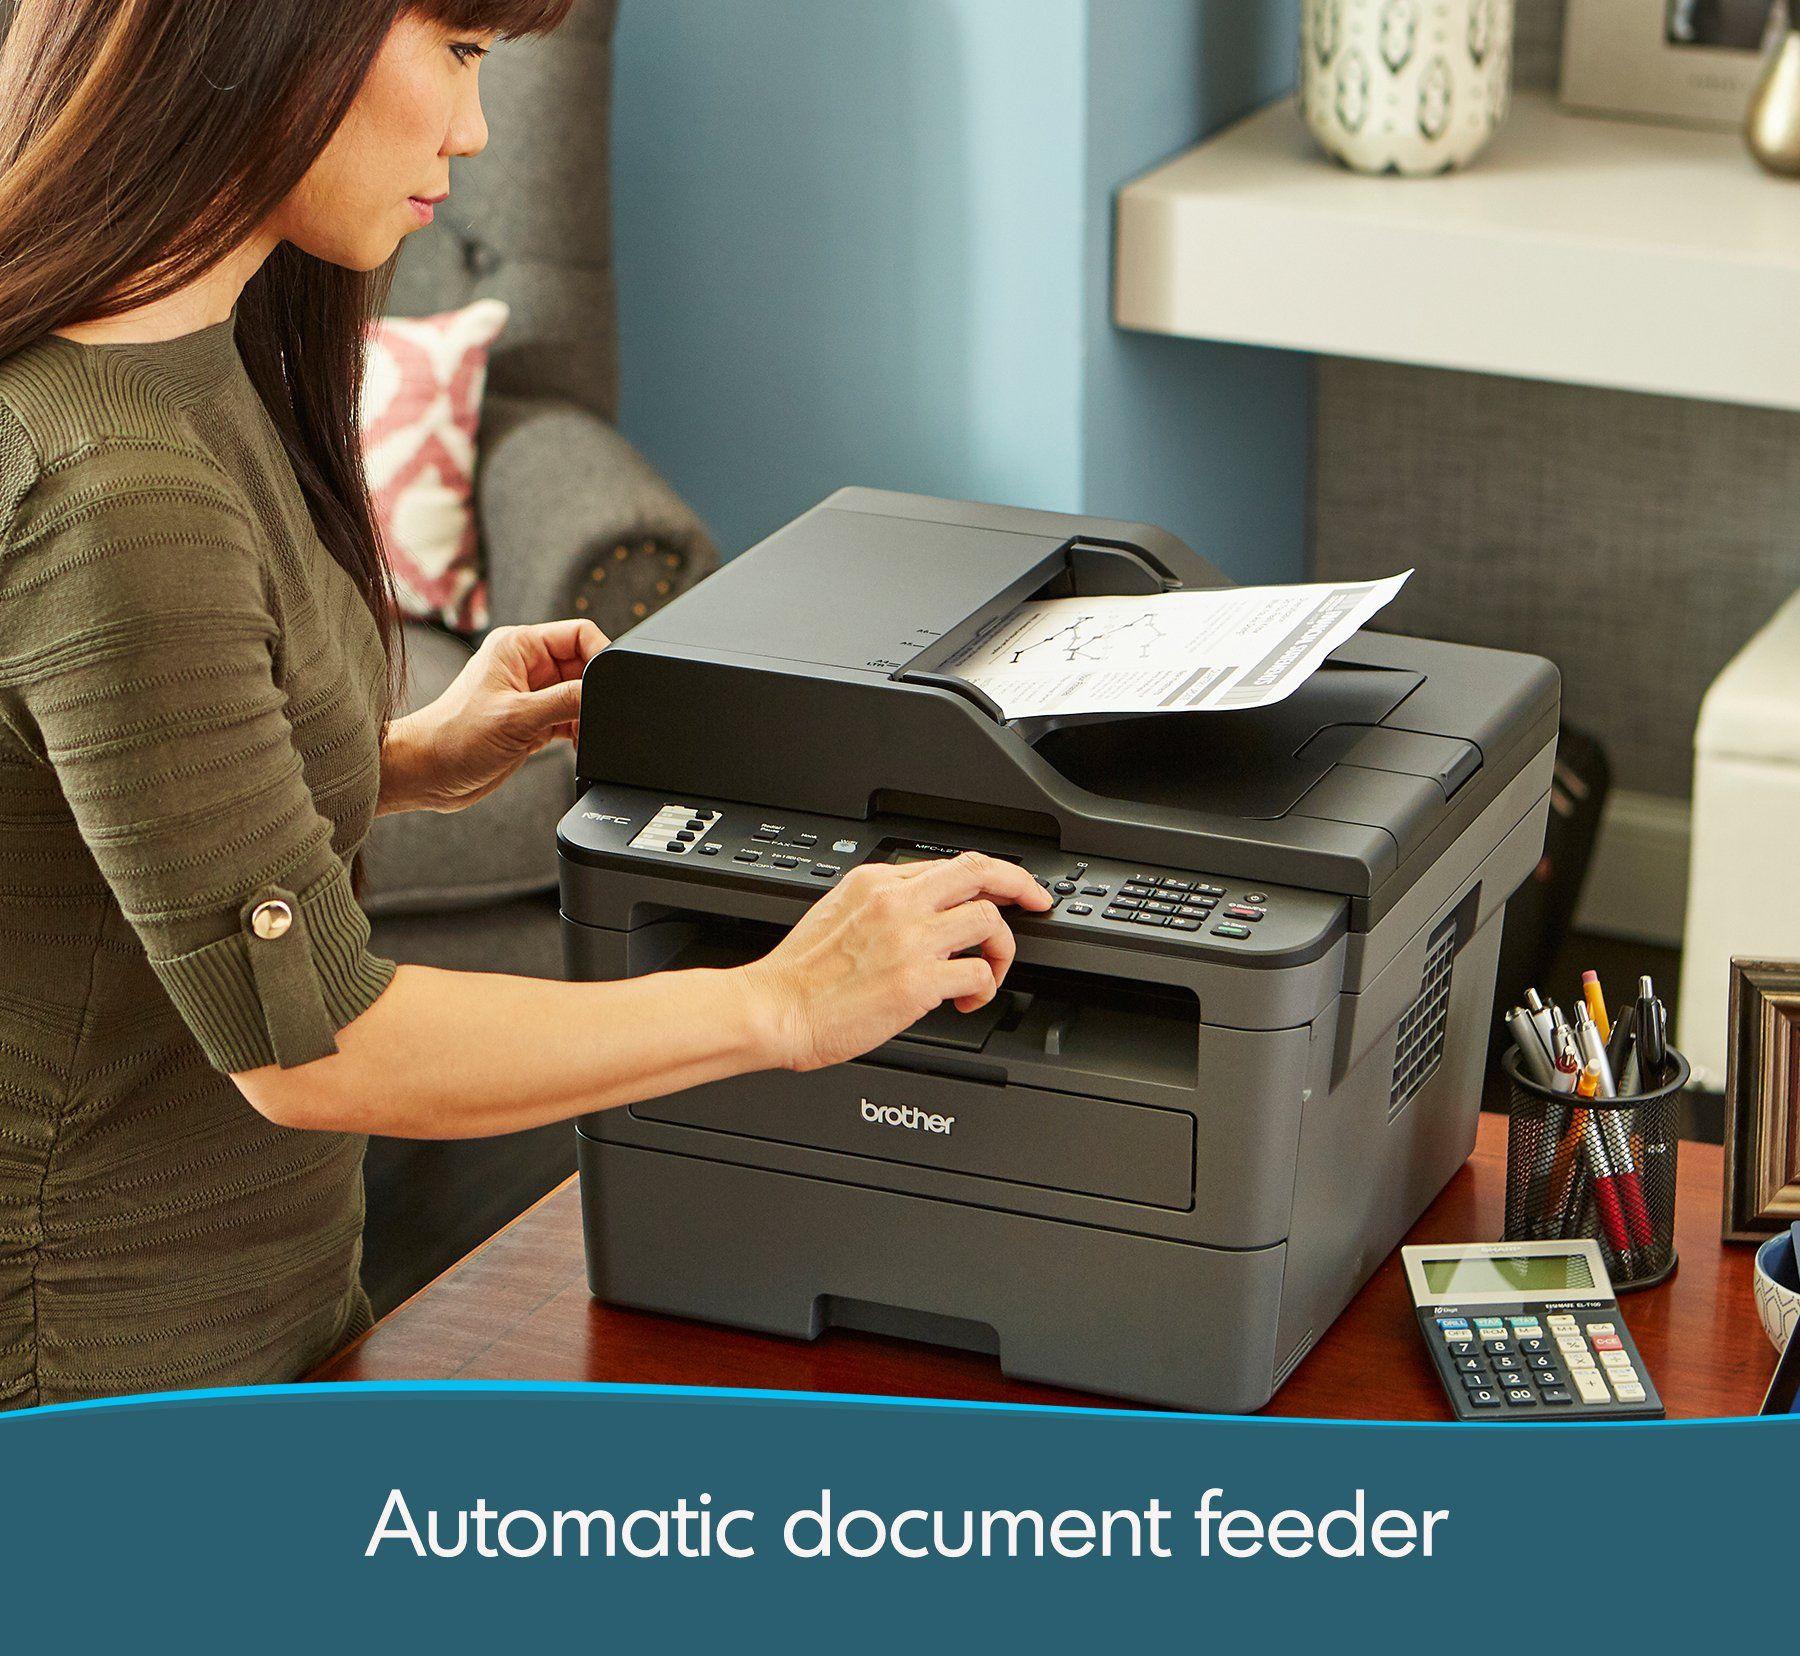 Brother Monochrome Laser Printer Compact Allin One Printer Multifunction Printer Mfcl2710dw Wireless Networking Multifunction Printer Brother Mfc Laser Printer